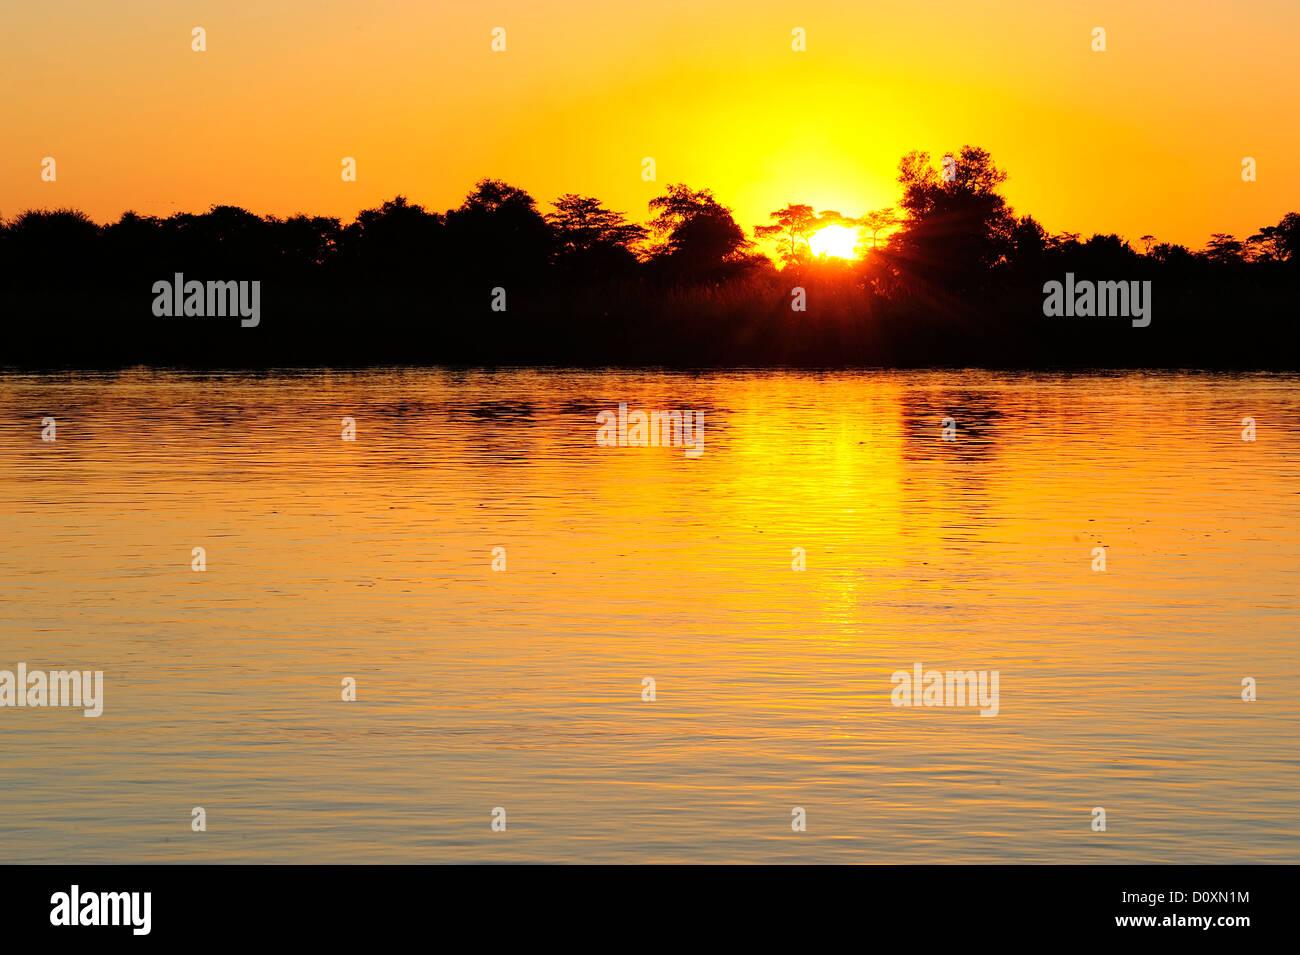 Africa, Namibia, Okavango, River, sunrise, landscape, water - Stock Image